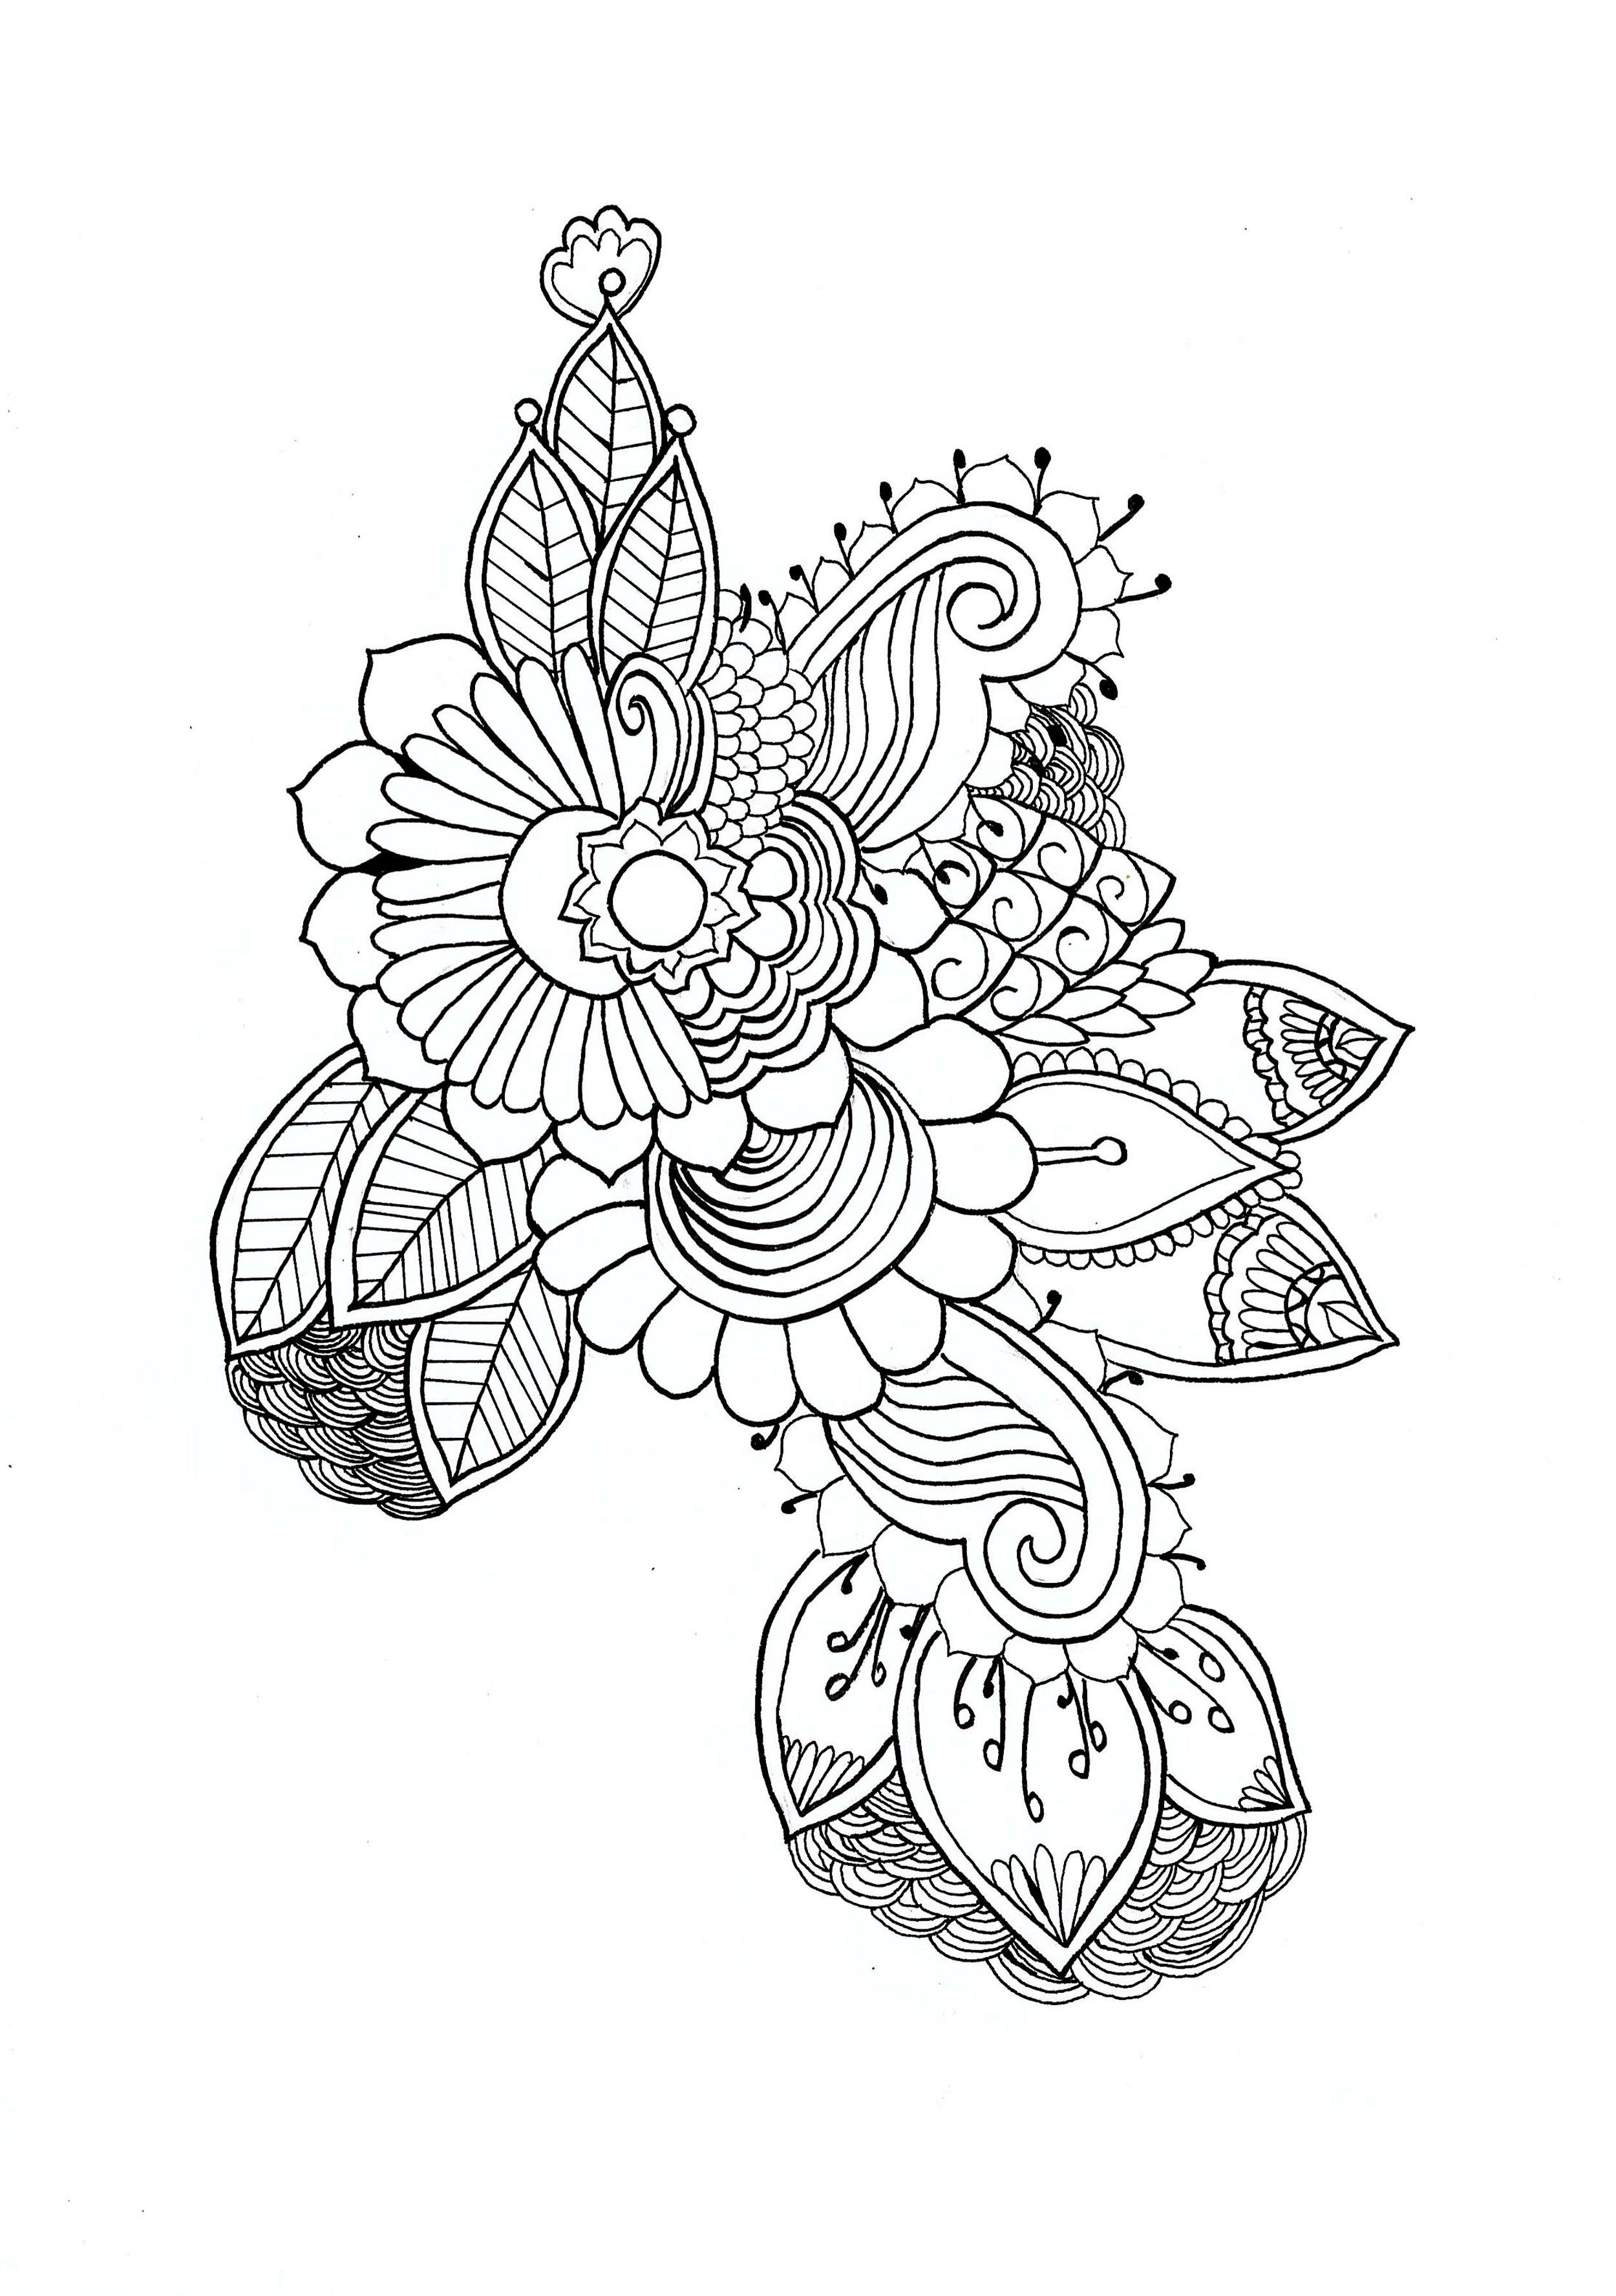 Mandalas 80609 Mandalas Disegni Da Colorare Per Adulti